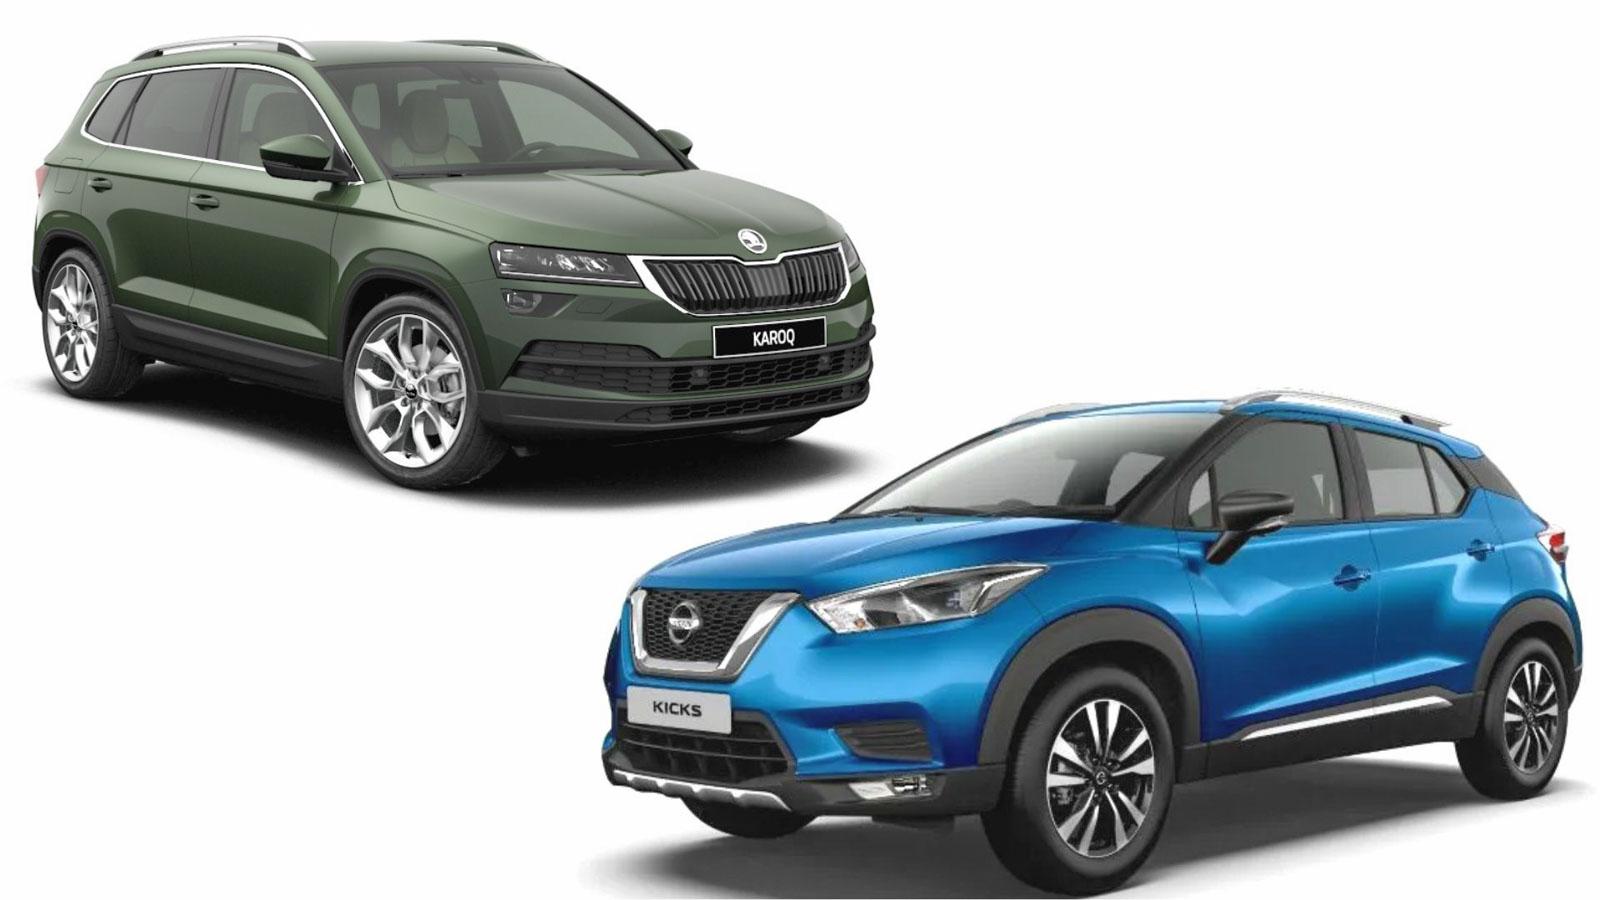 Nissan Kicks Has More Power Than Skoda Karoq For Half Its Price